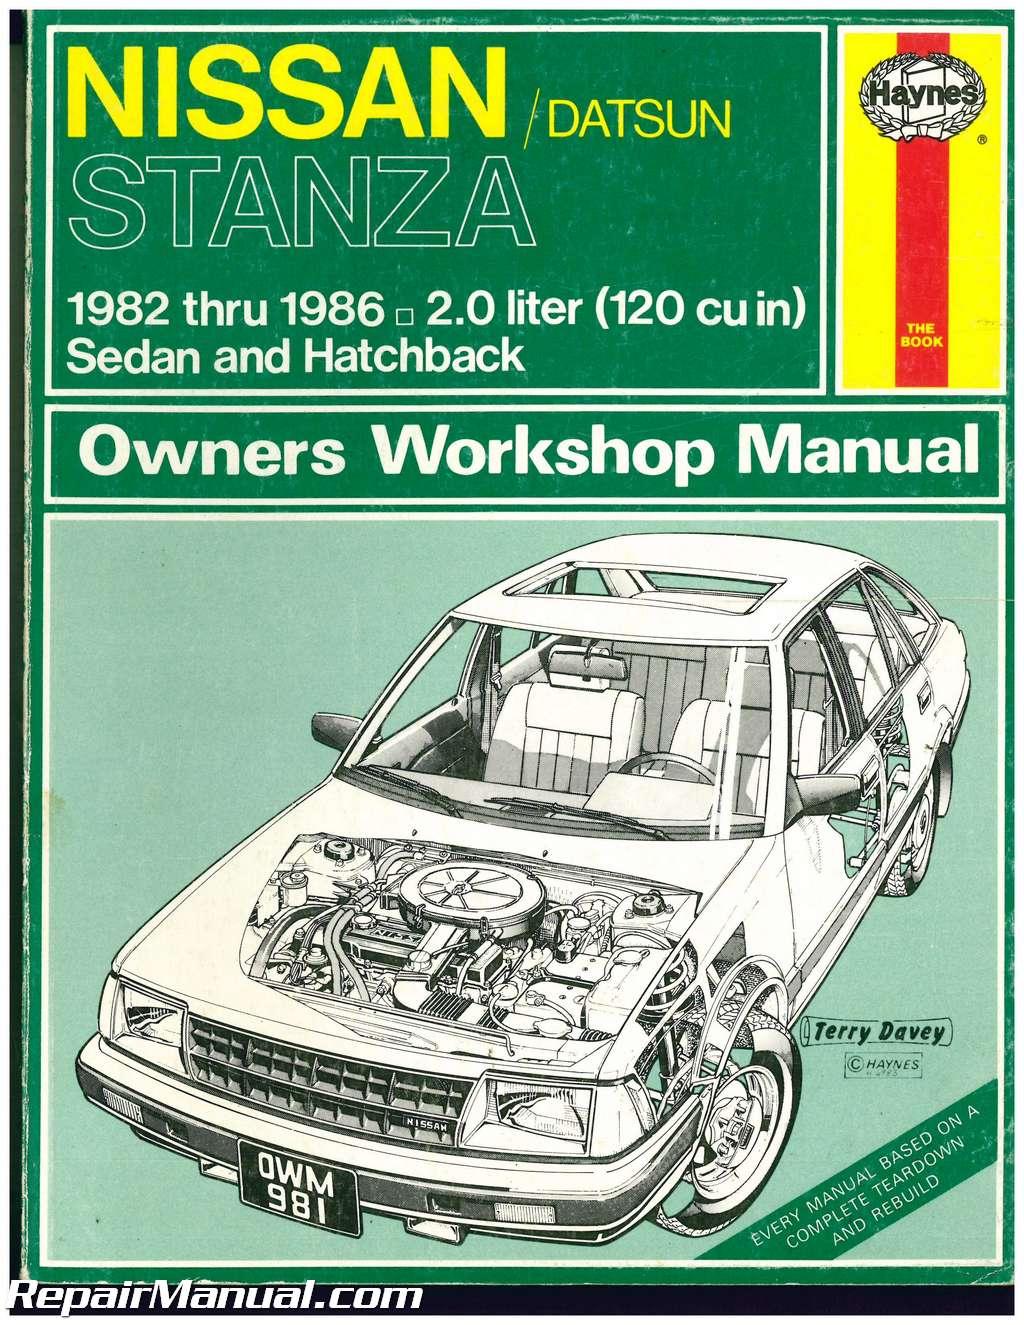 used haynes datsun nissan stanza 1982 1986 auto repair manual rh repairmanual com Auto -Owners Manuals Auto -Owners Manuals